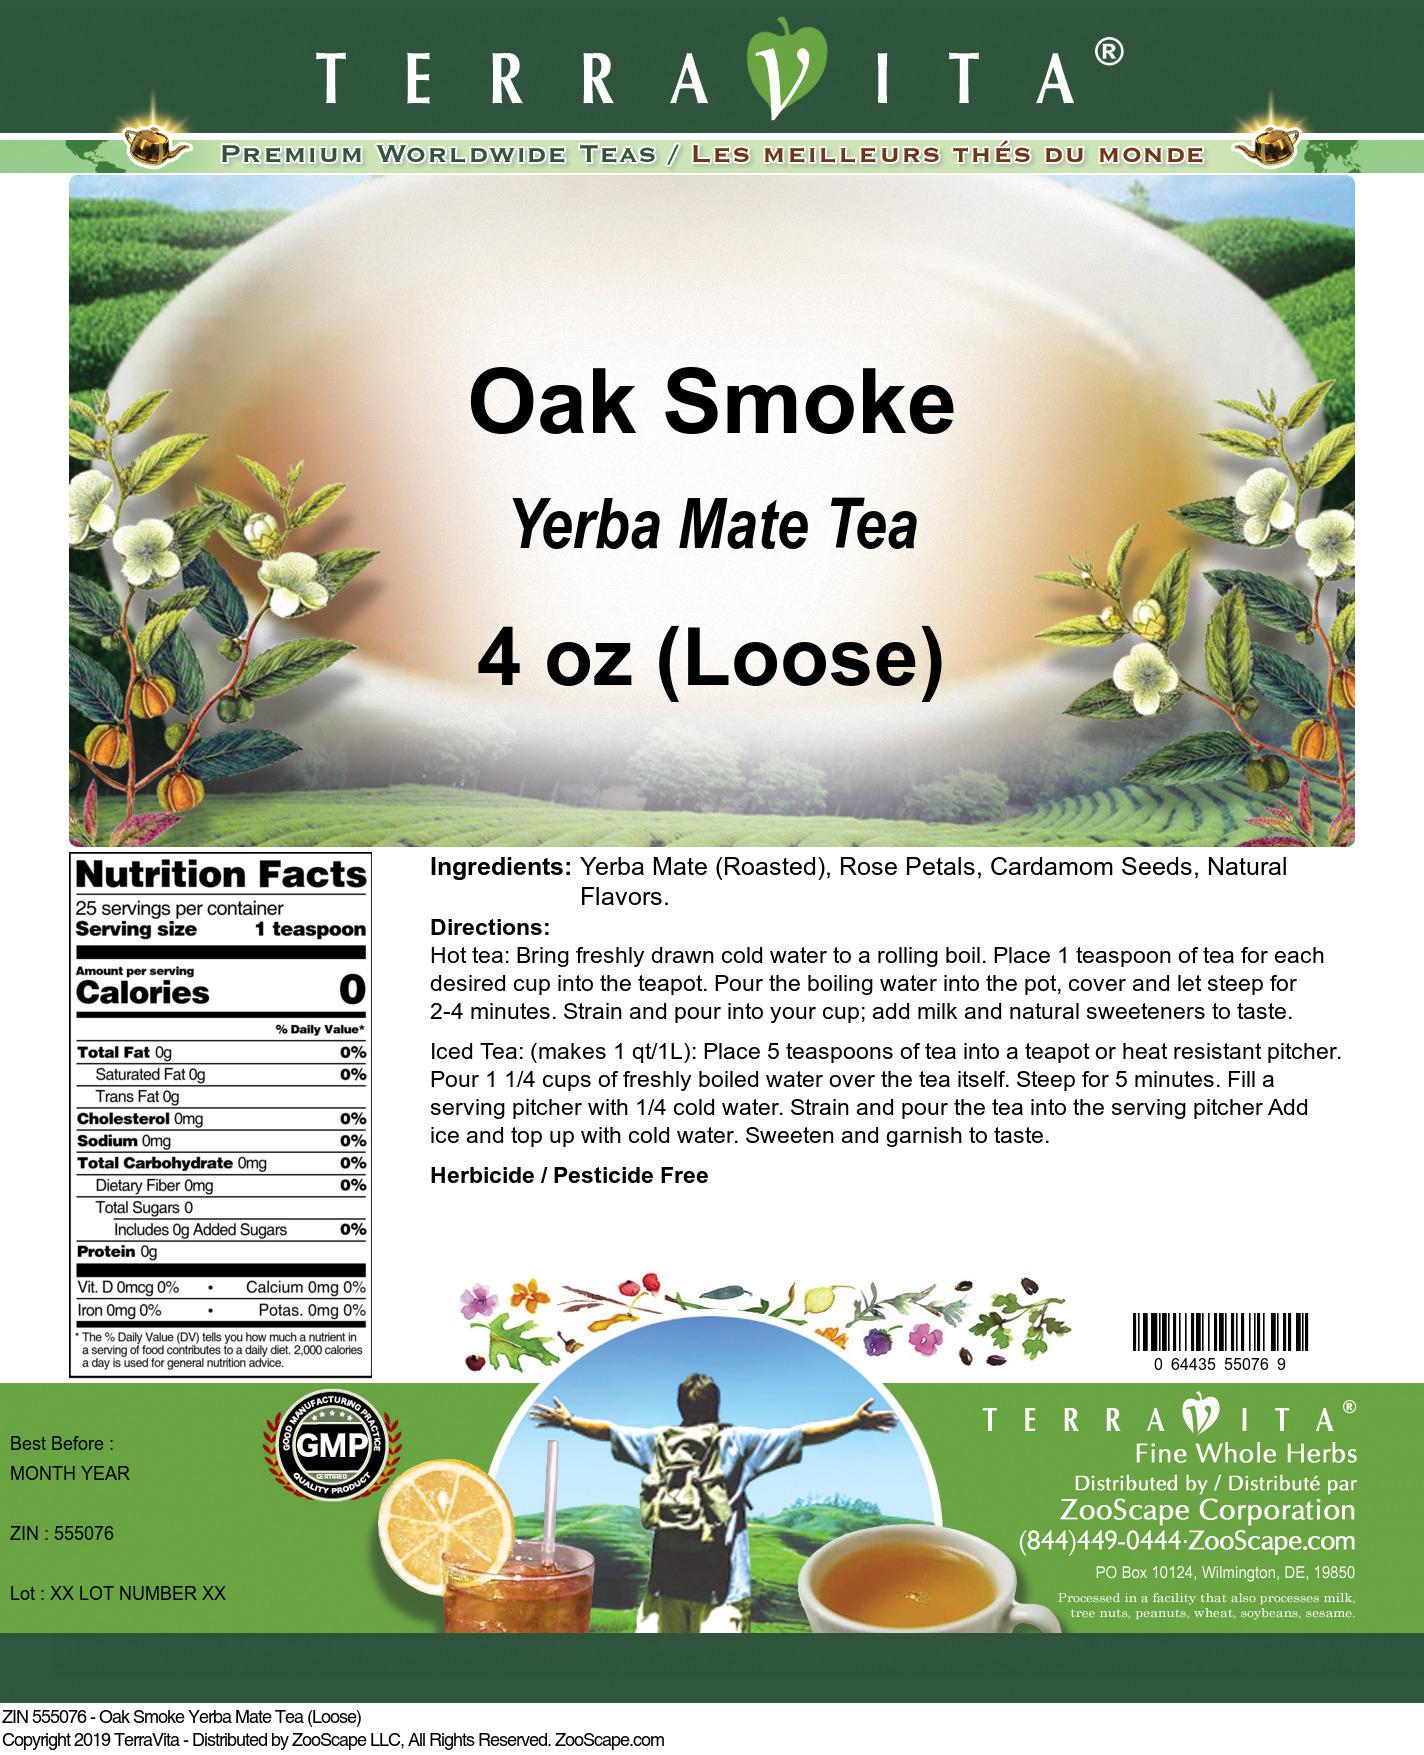 Oak Smoke Yerba Mate Tea (Loose)